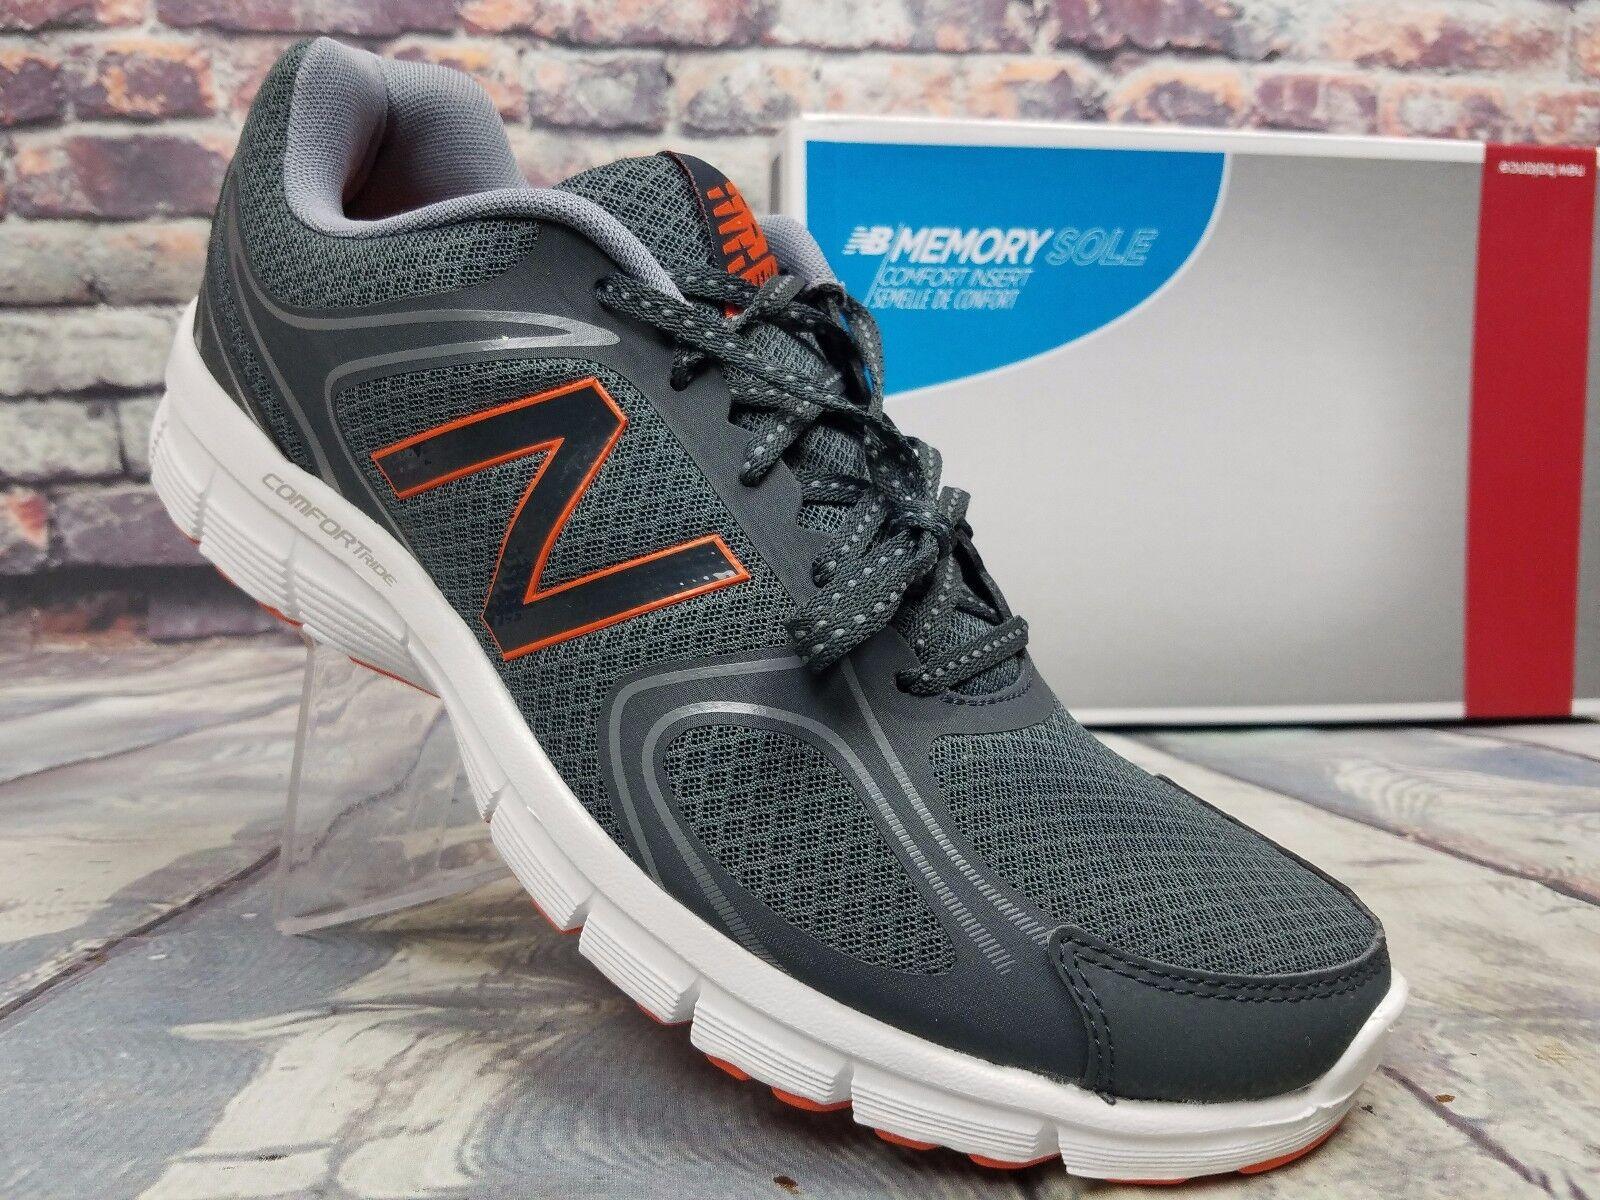 Mens NEW BALANCE Shoes Comfort Ride Running Athletic Gray / Orange  Sz 11 D US